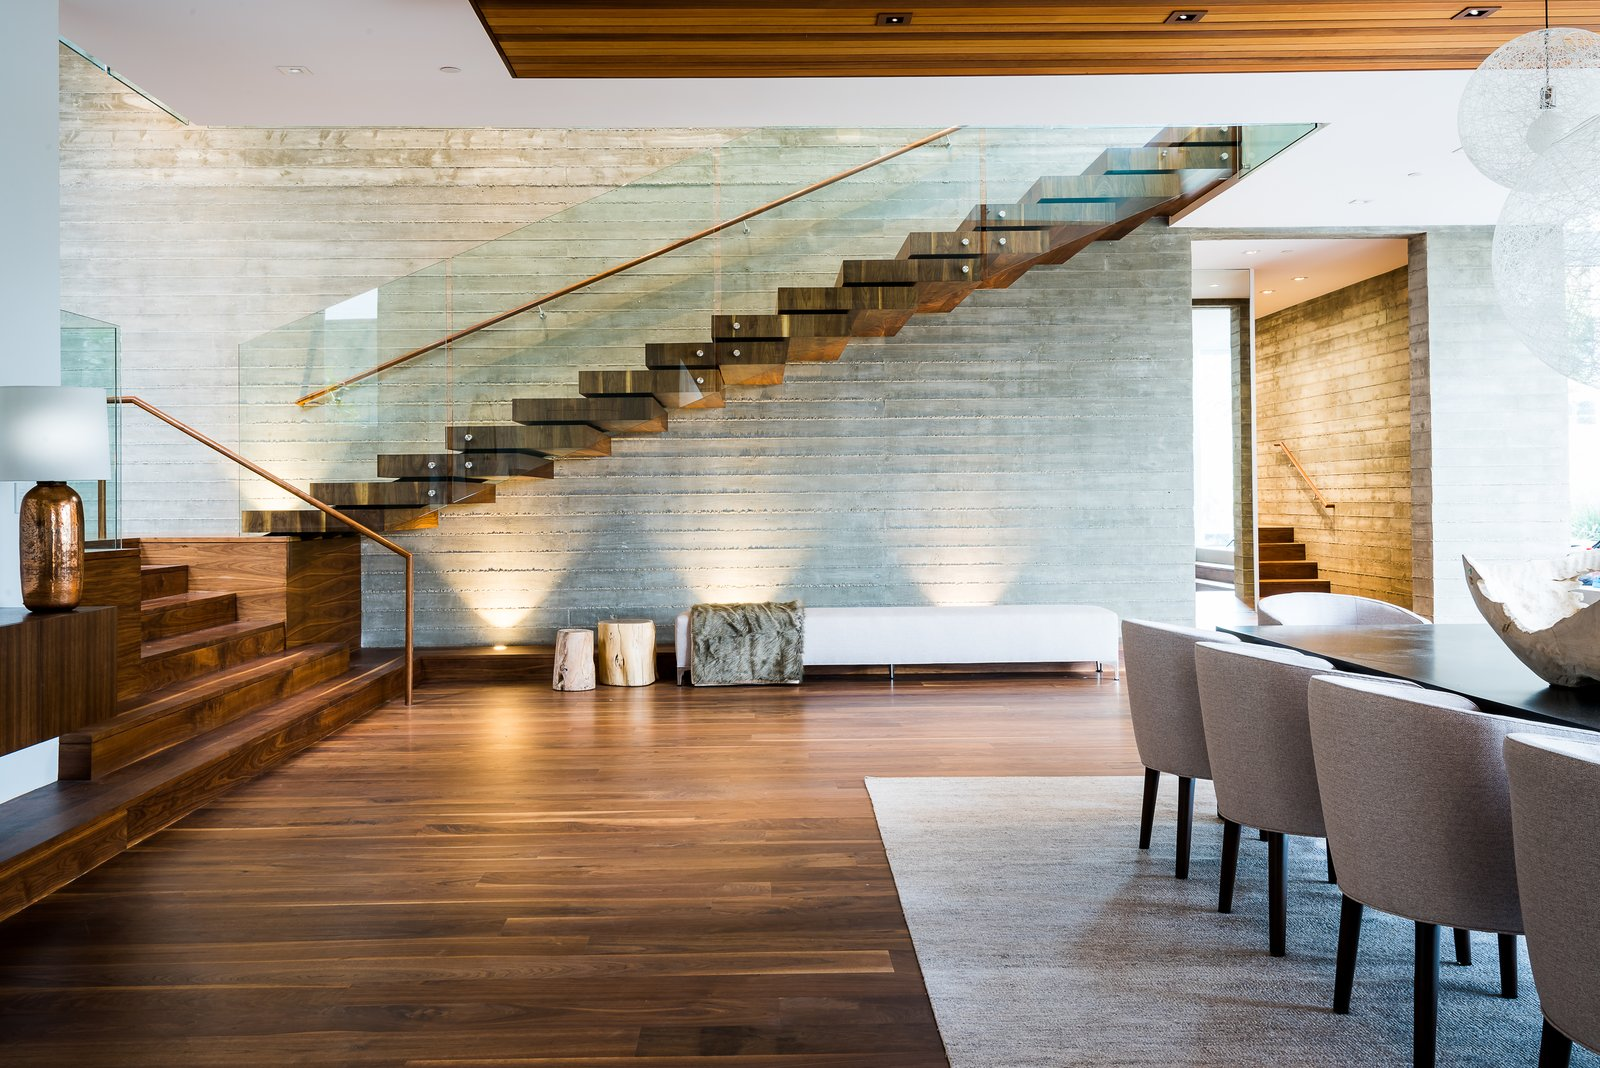 Dining Room, Chair, Dark Hardwood Floor, Table, Bench, Recessed Lighting, and Ceiling Lighting  Ravoli Drive Residence